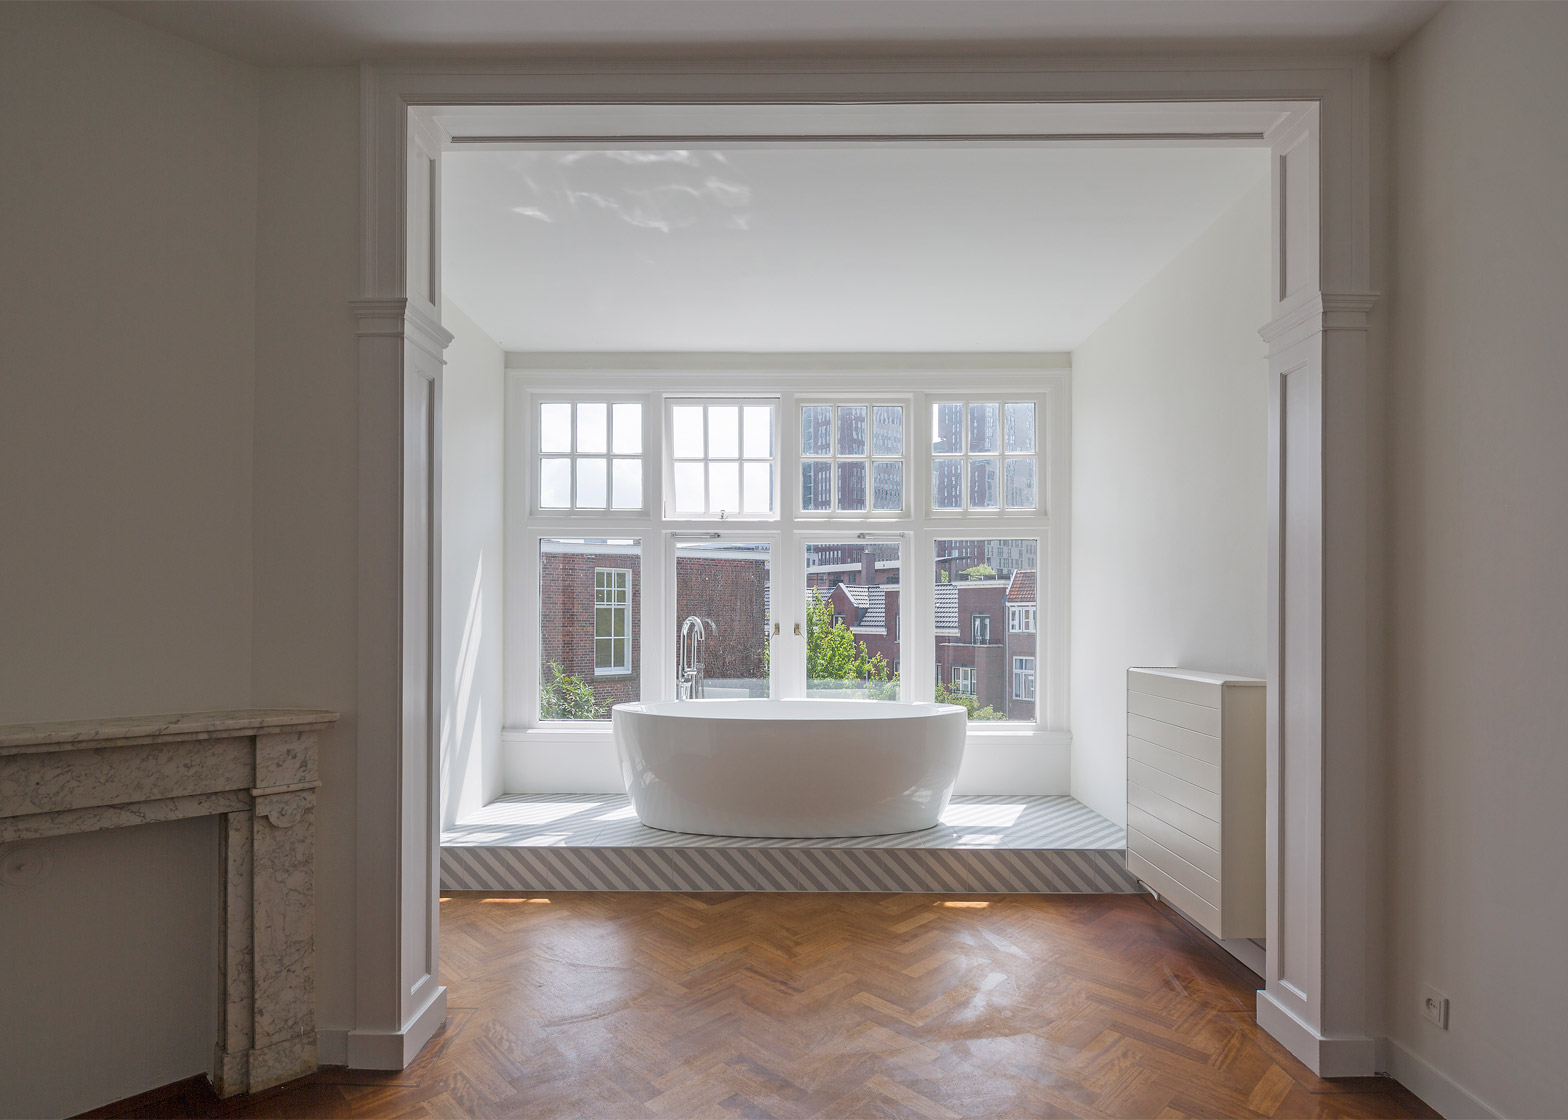 architecture_renovation_project_hague-interior_house__design_studia_interiors_osnovadesign_osnova_poltava_02